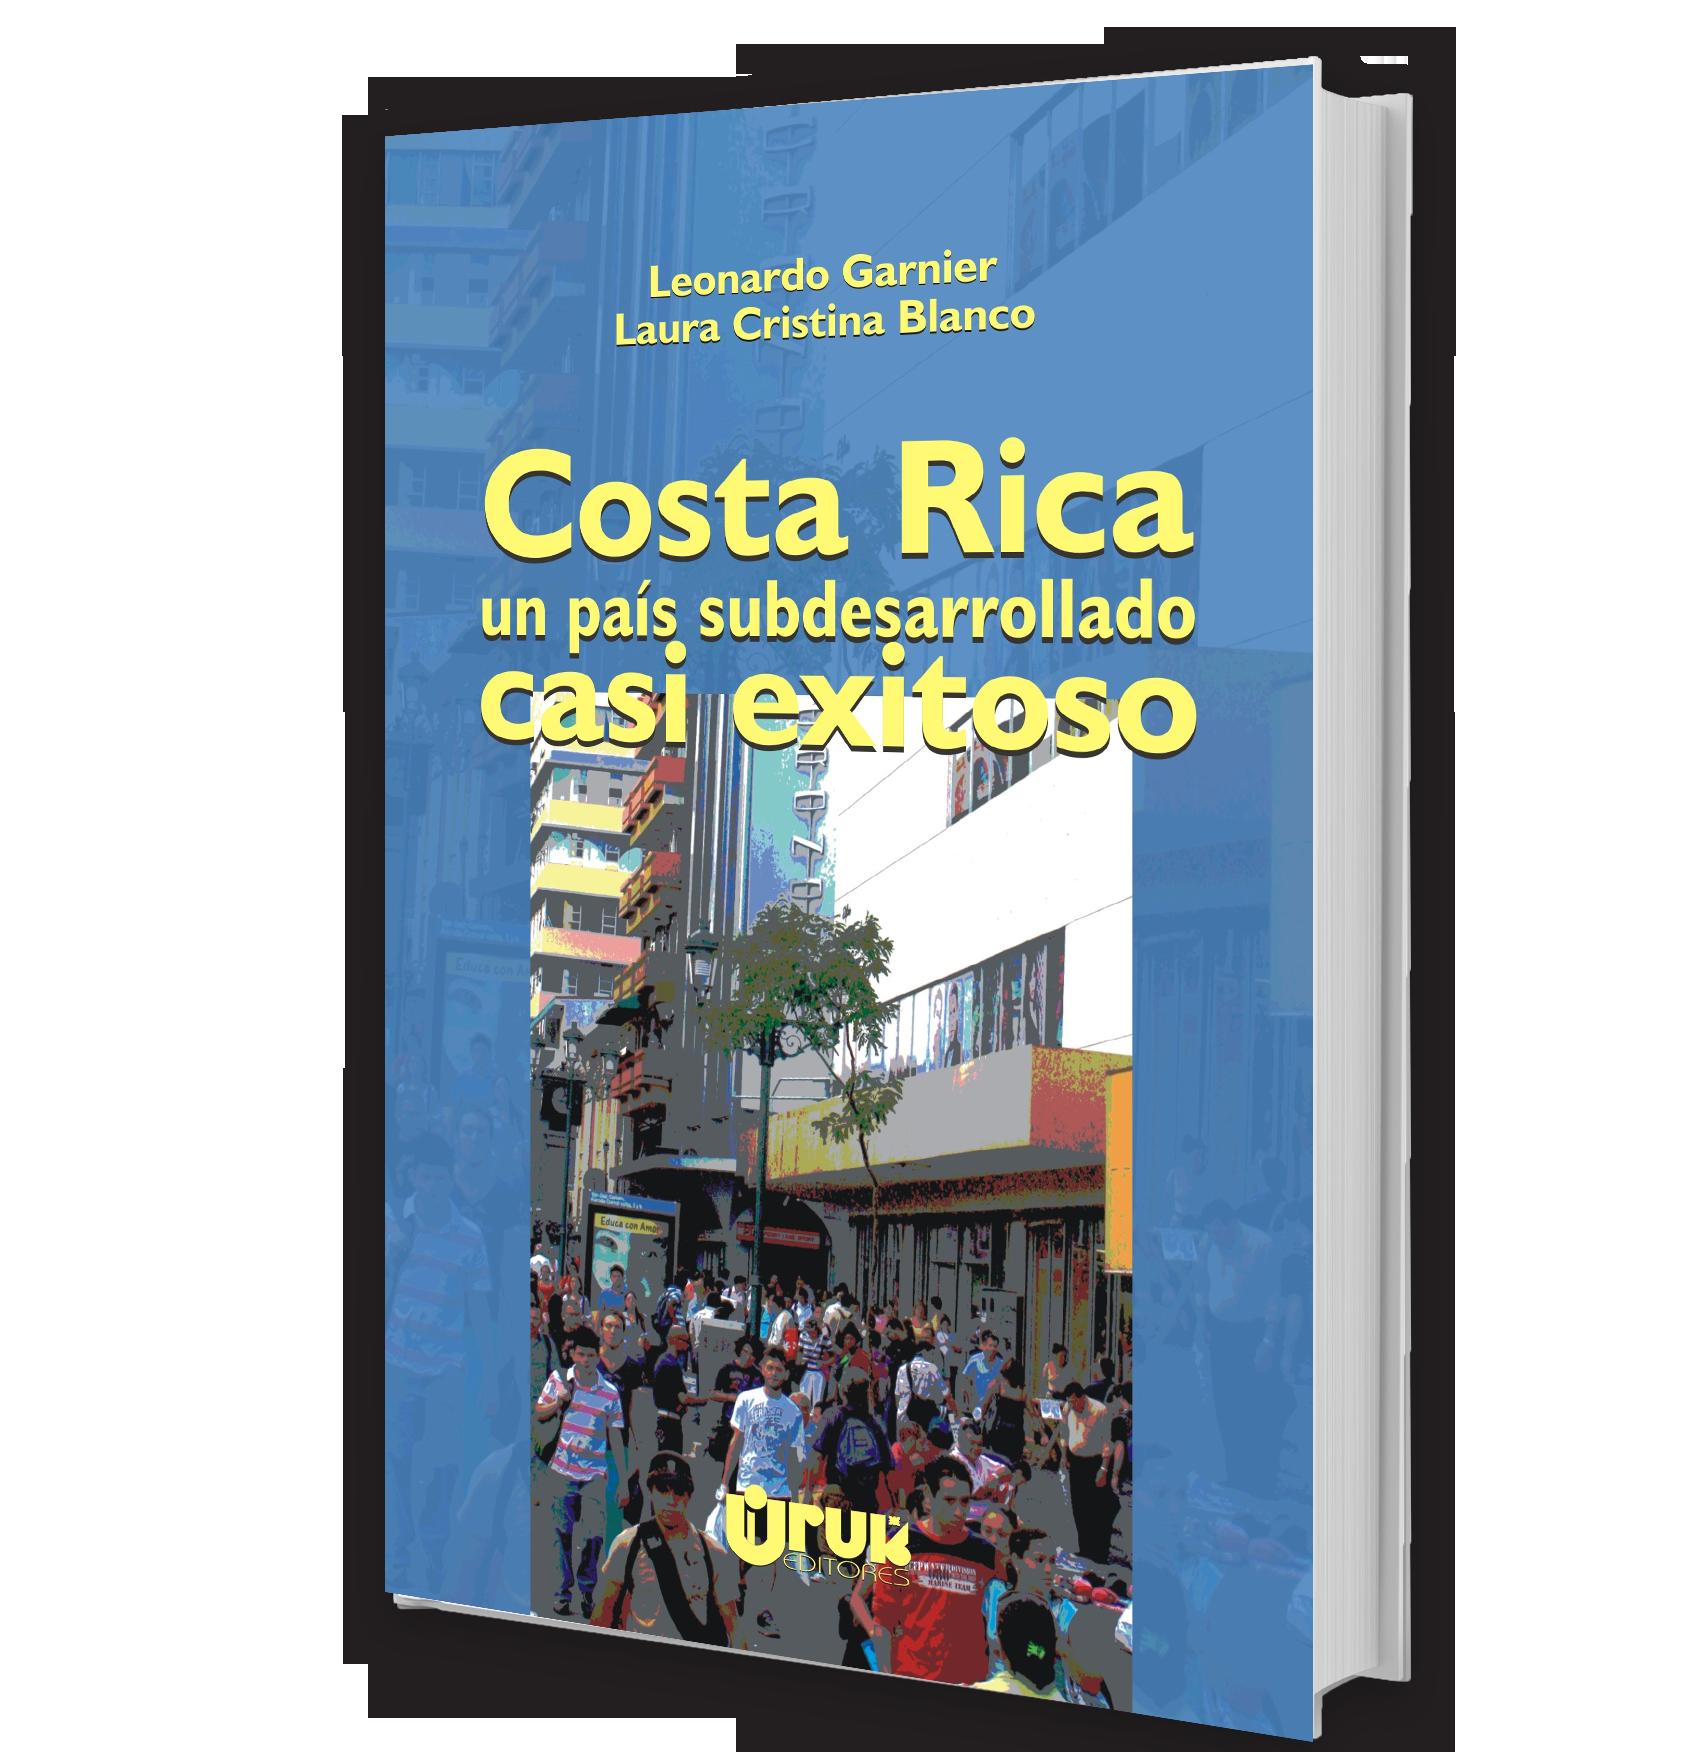 Costa Rica un país subdesarrollado casi exitoso